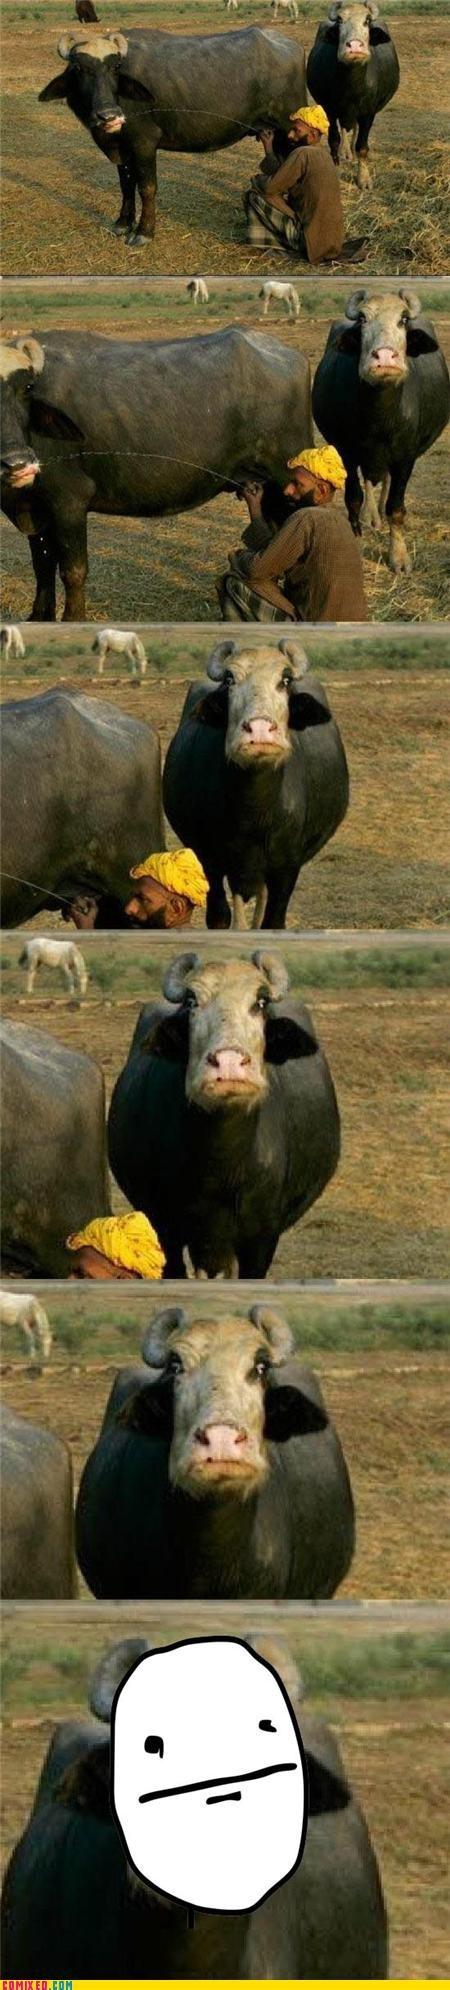 animals,cows,makes sense,poker face,recycling,wtf